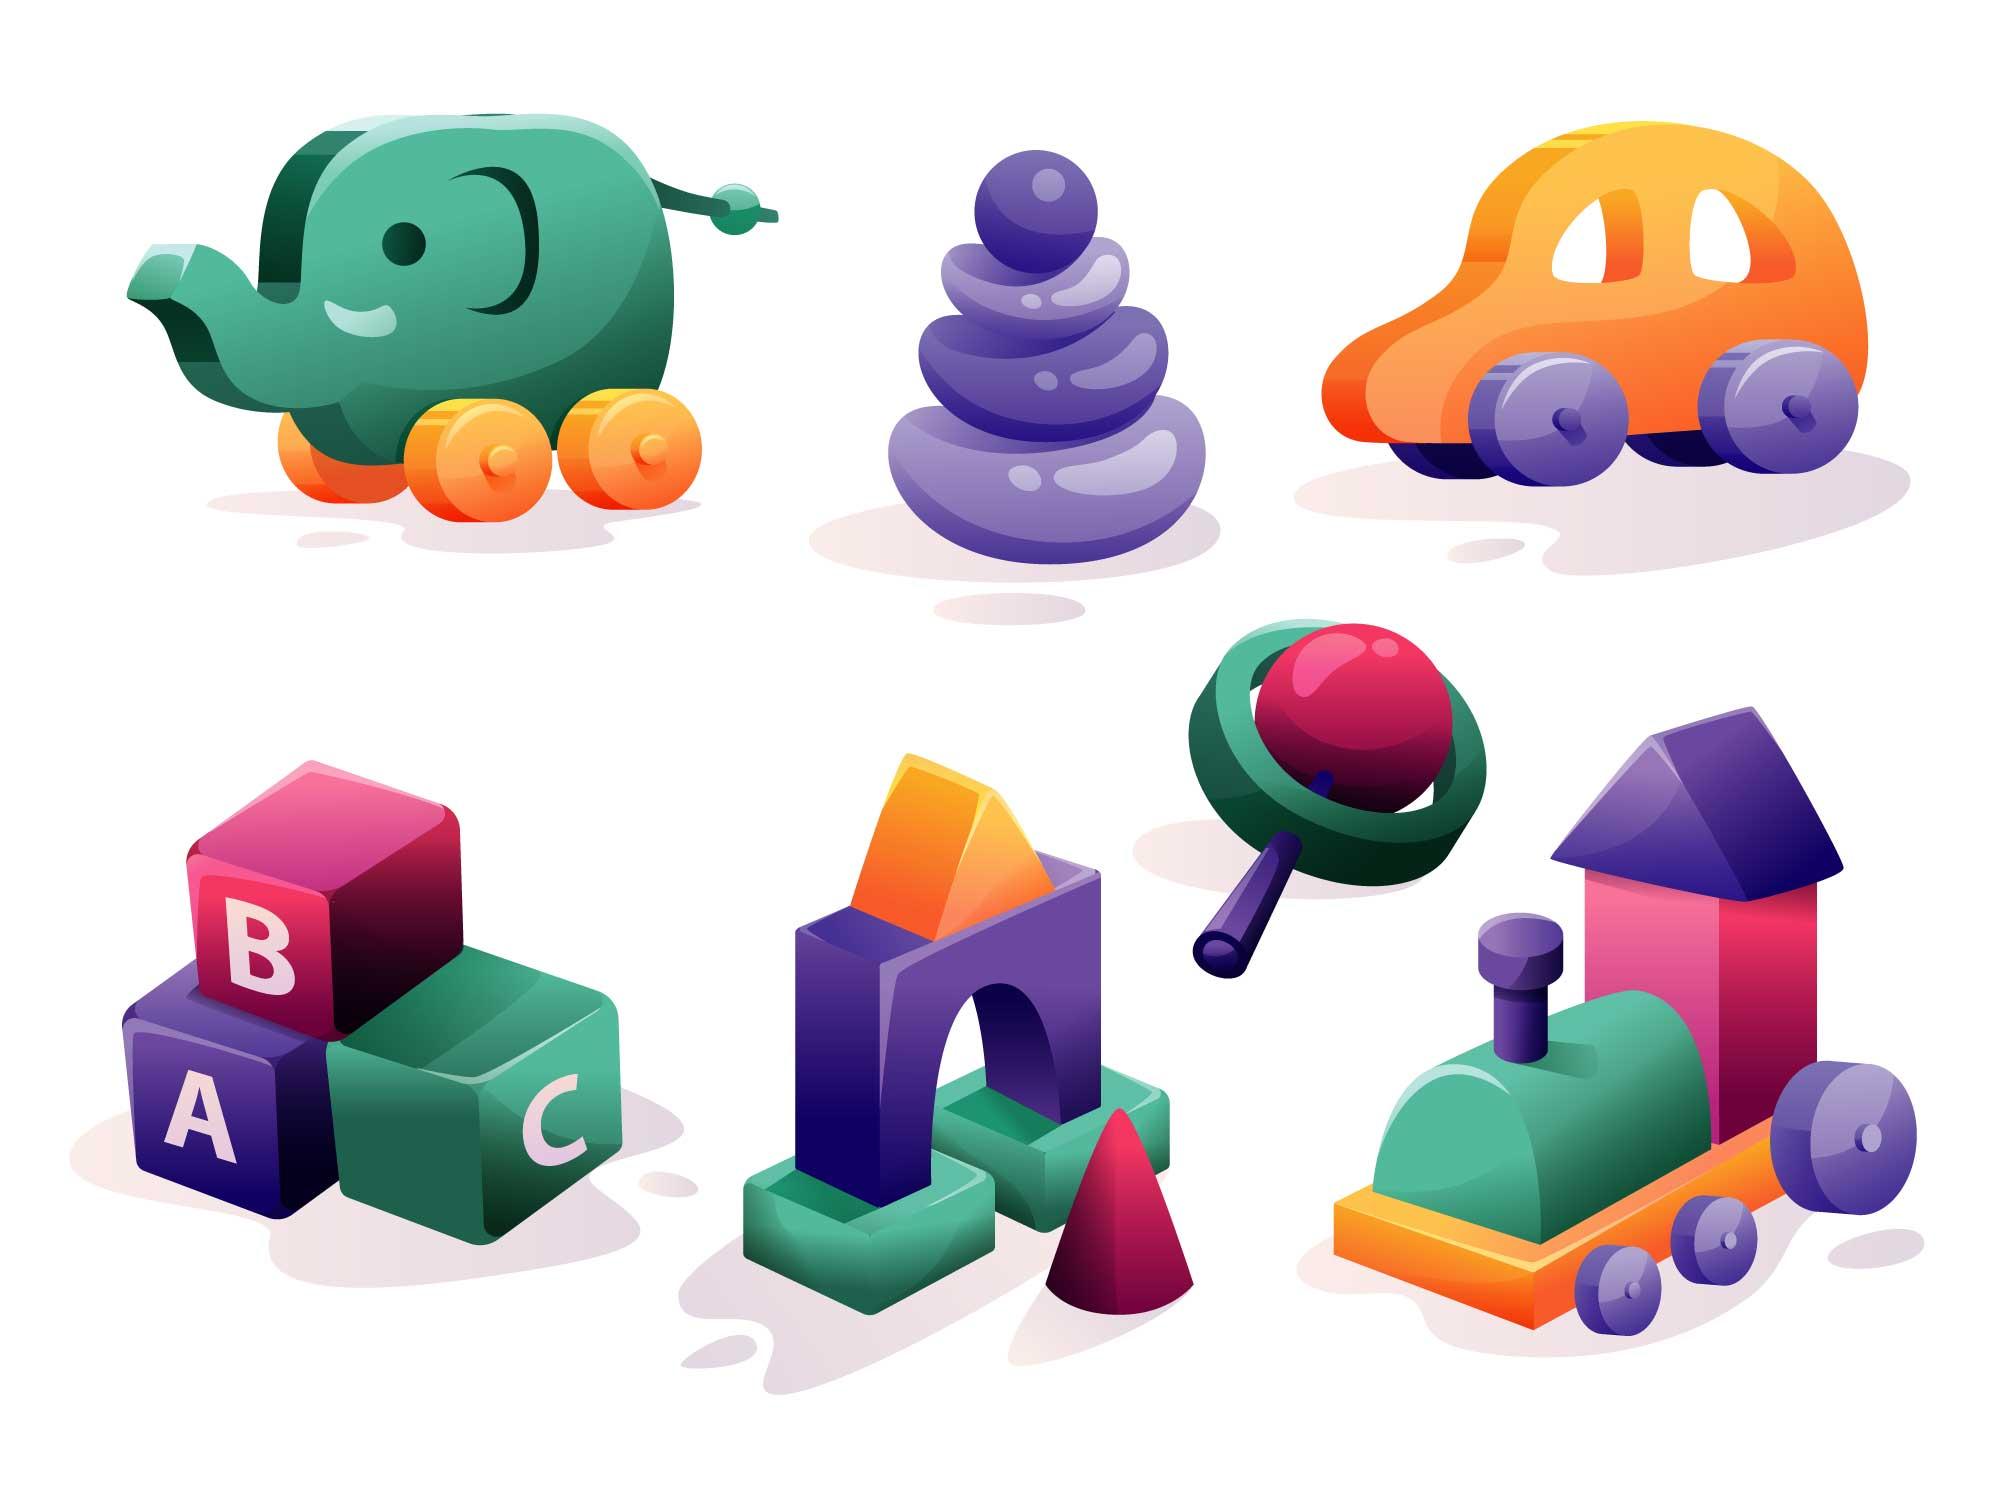 Baby Toys Illustration